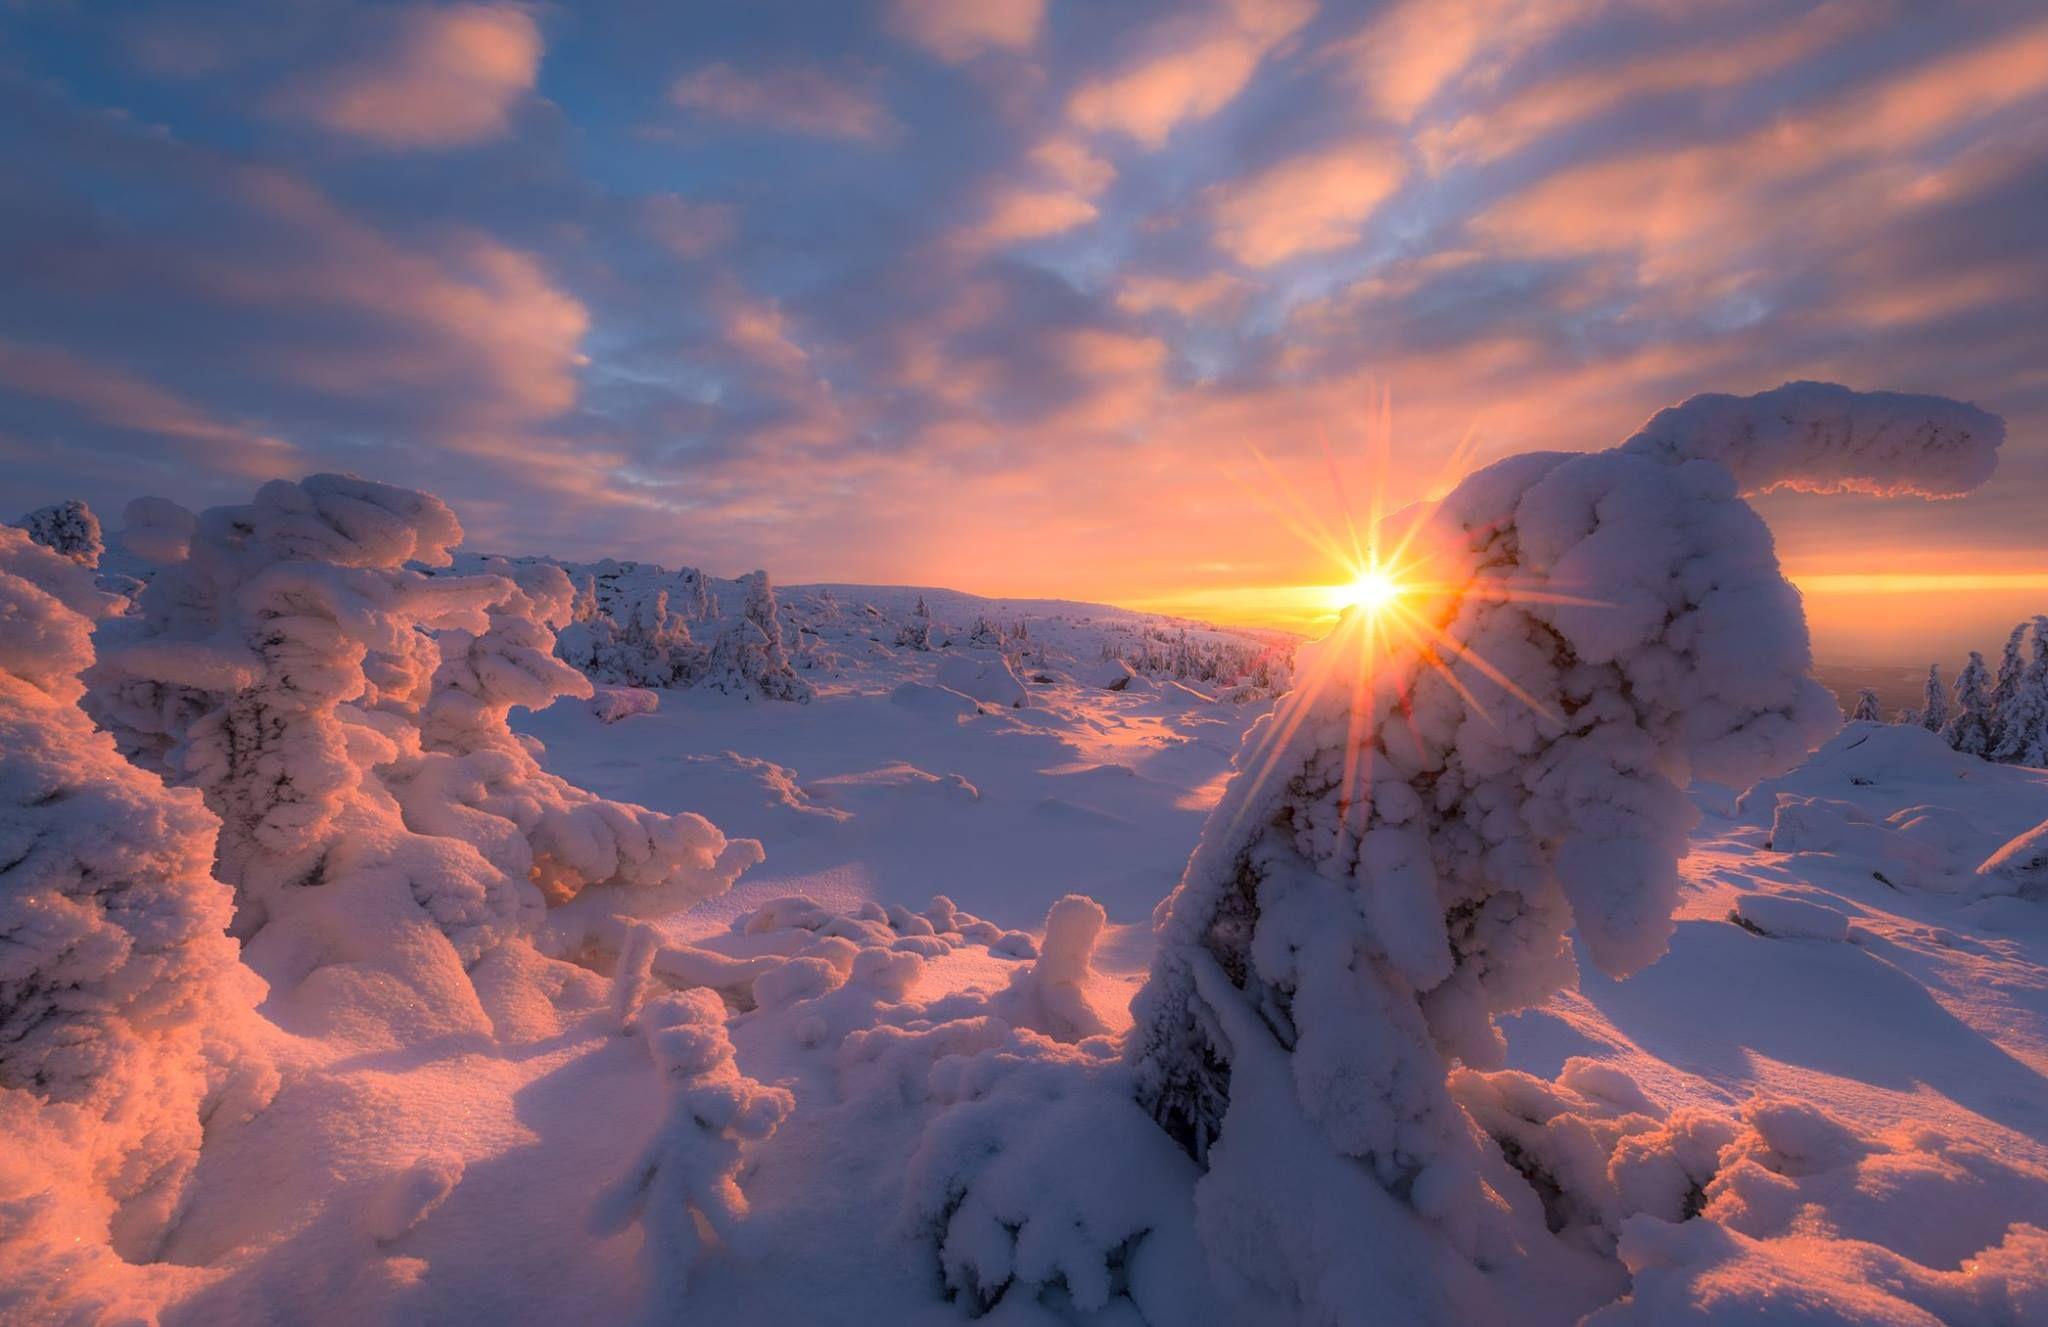 всё зимнее небо фото самой